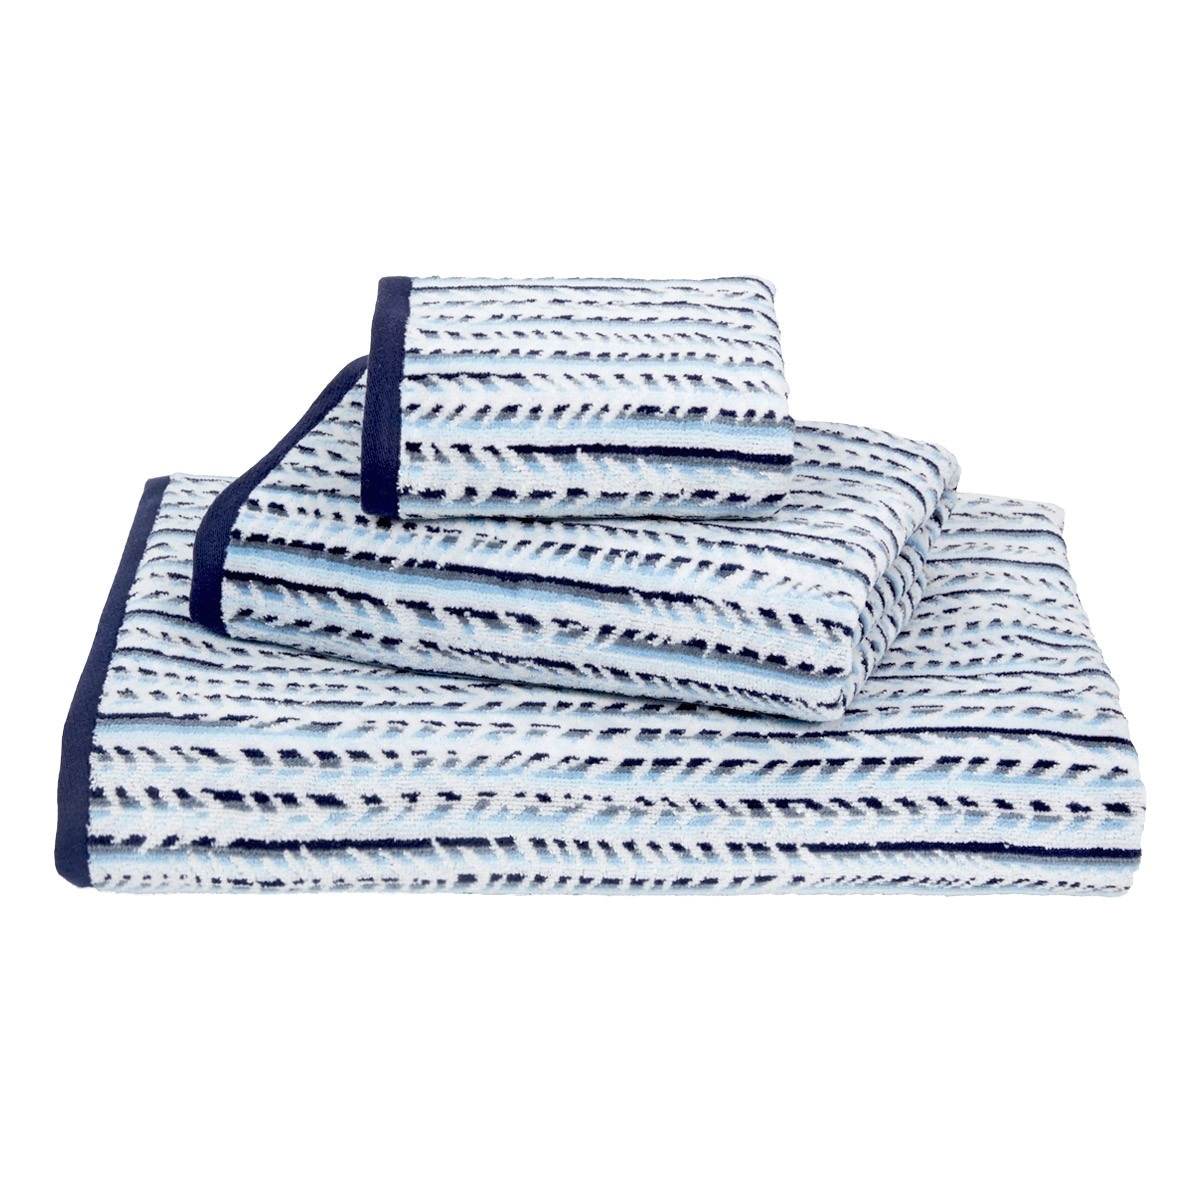 bath sheet vs bath towel awesome canaletto towel bath towels bath linen olivier desforges of bath